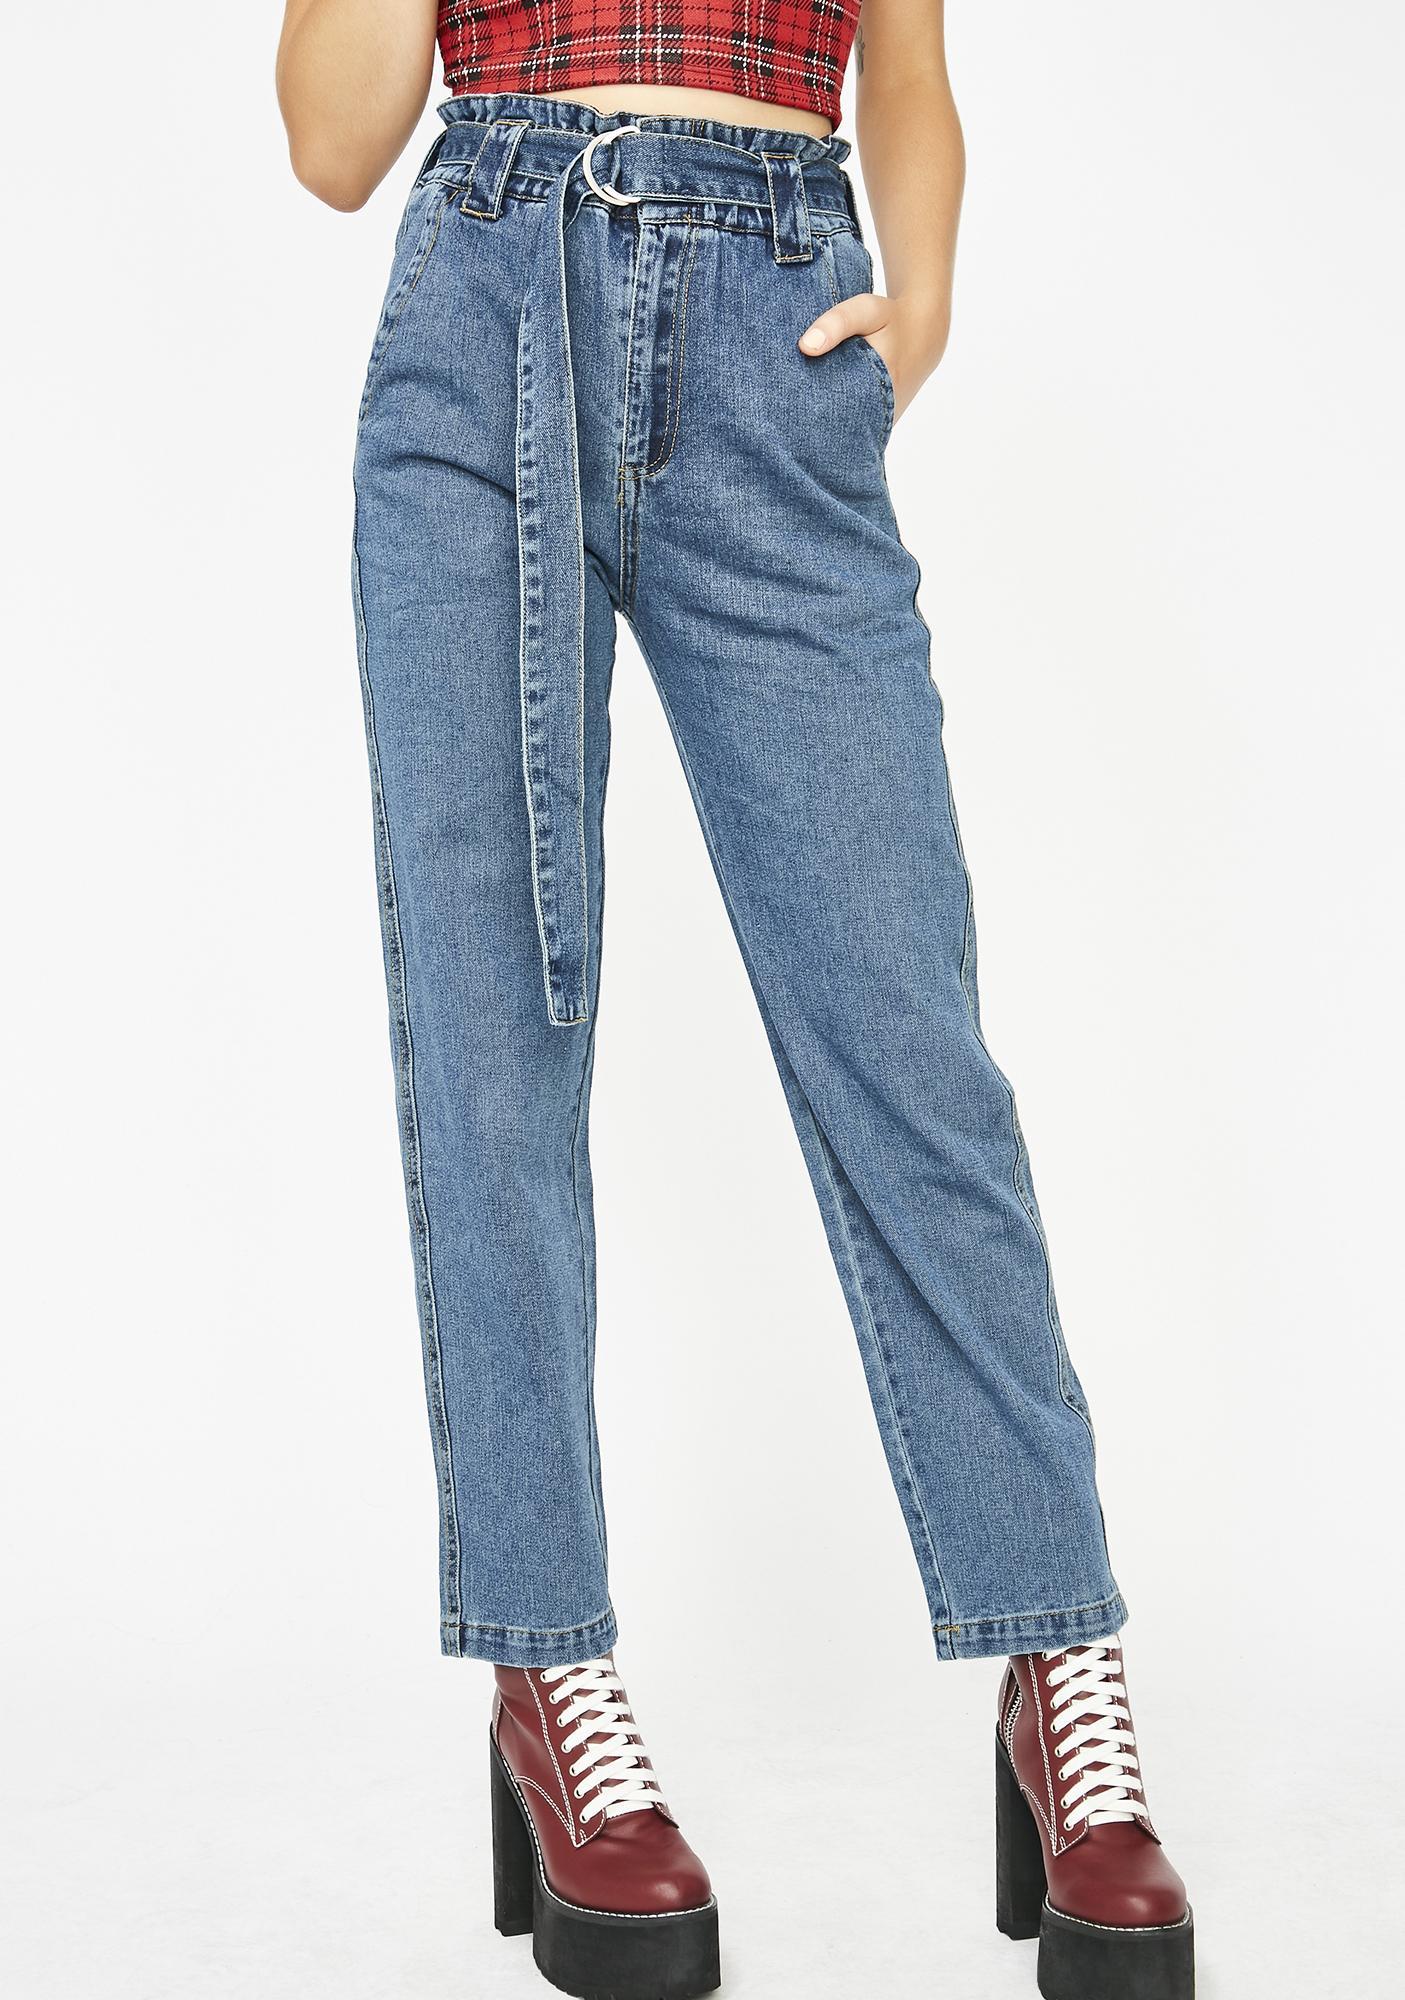 Varsity Blues Belted Jeans